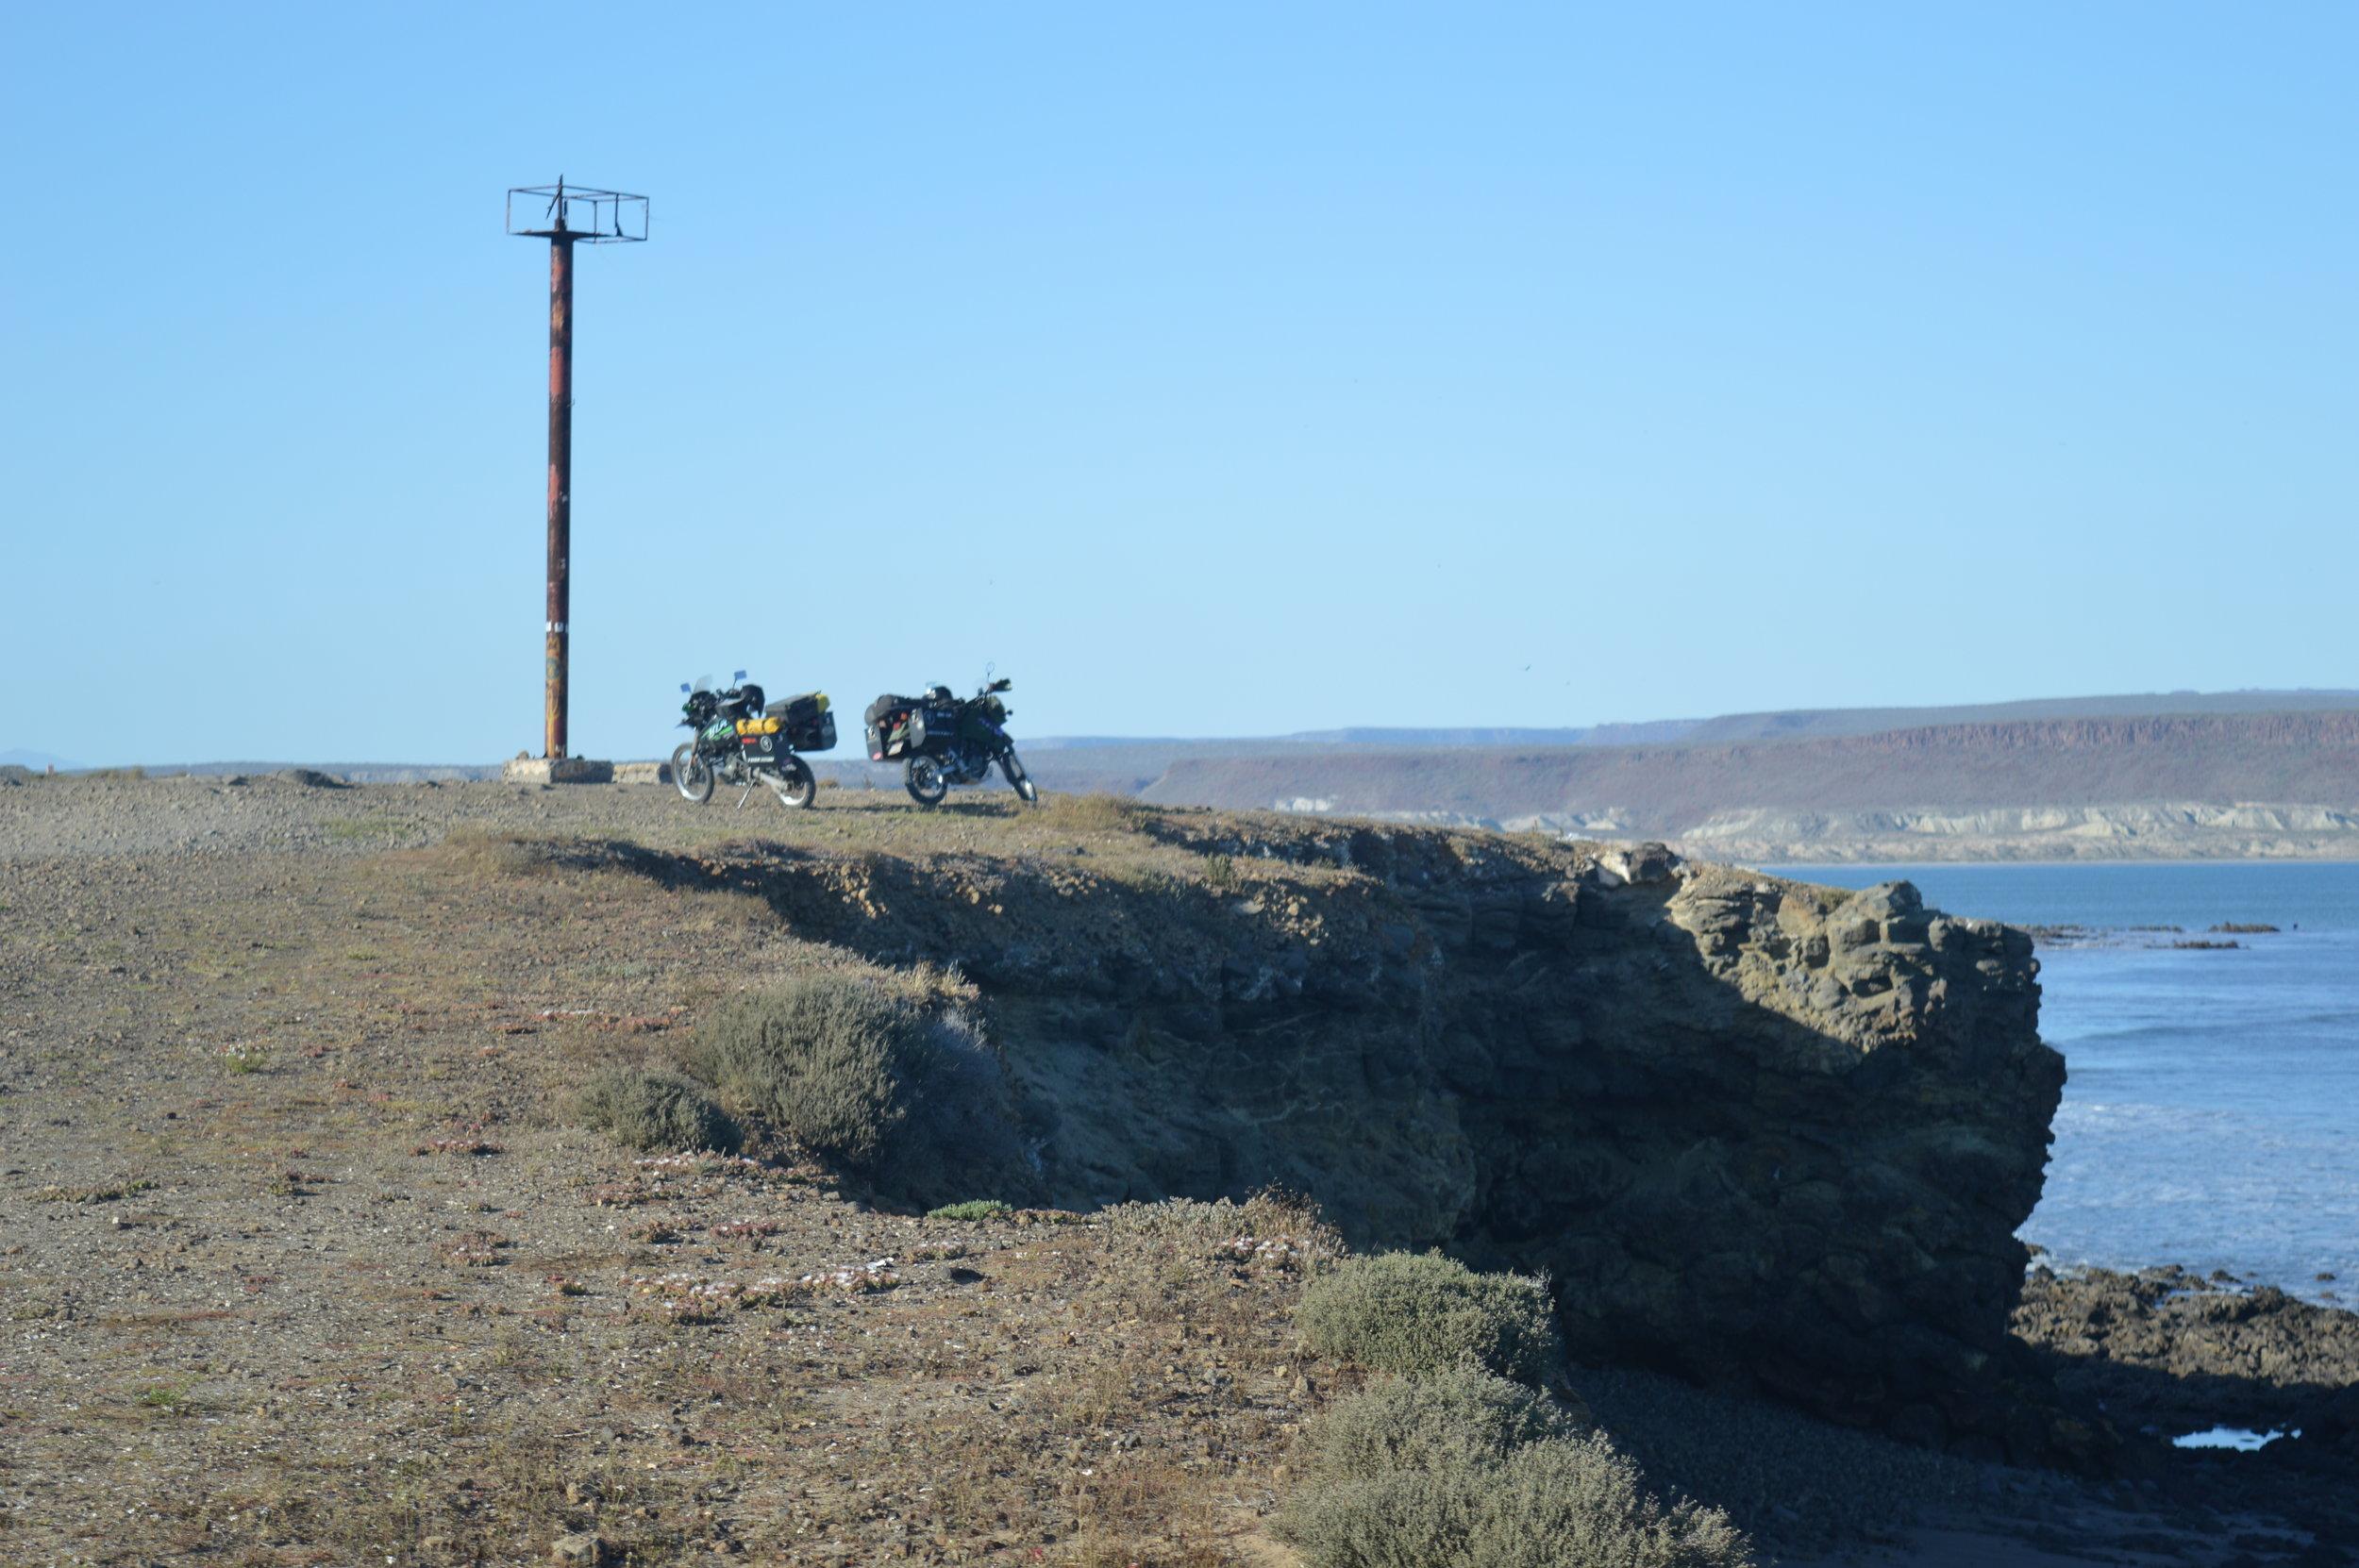 Bikes on bluff overlooking Scorpion Bay (San Juanico)